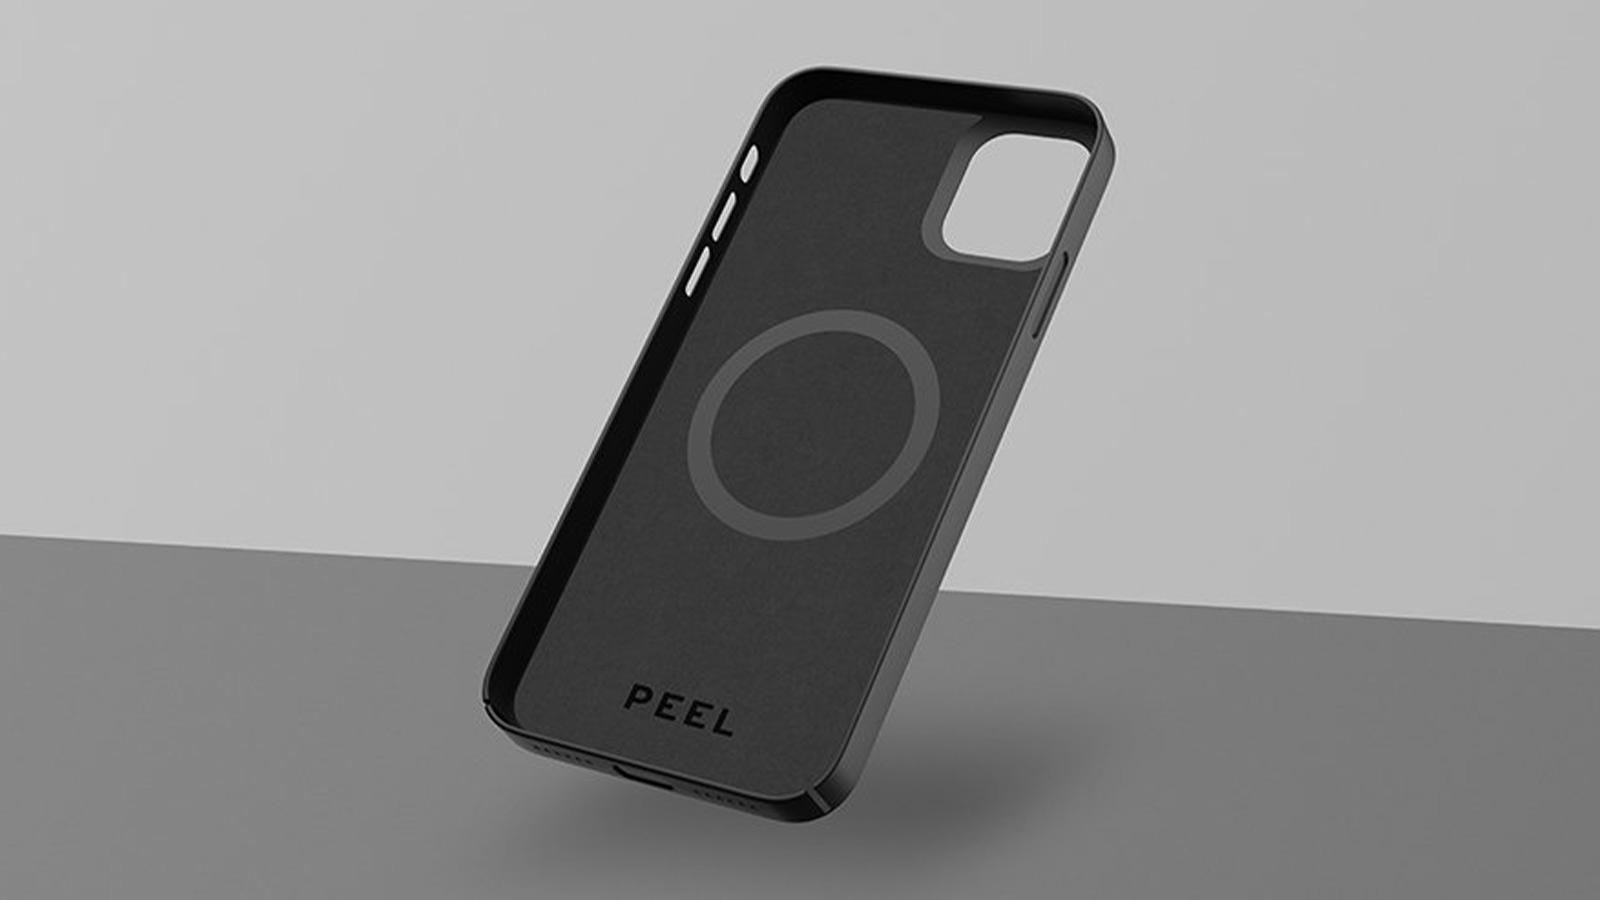 Peel Super Thin iPhone 12 Pro Max MagSafe Case